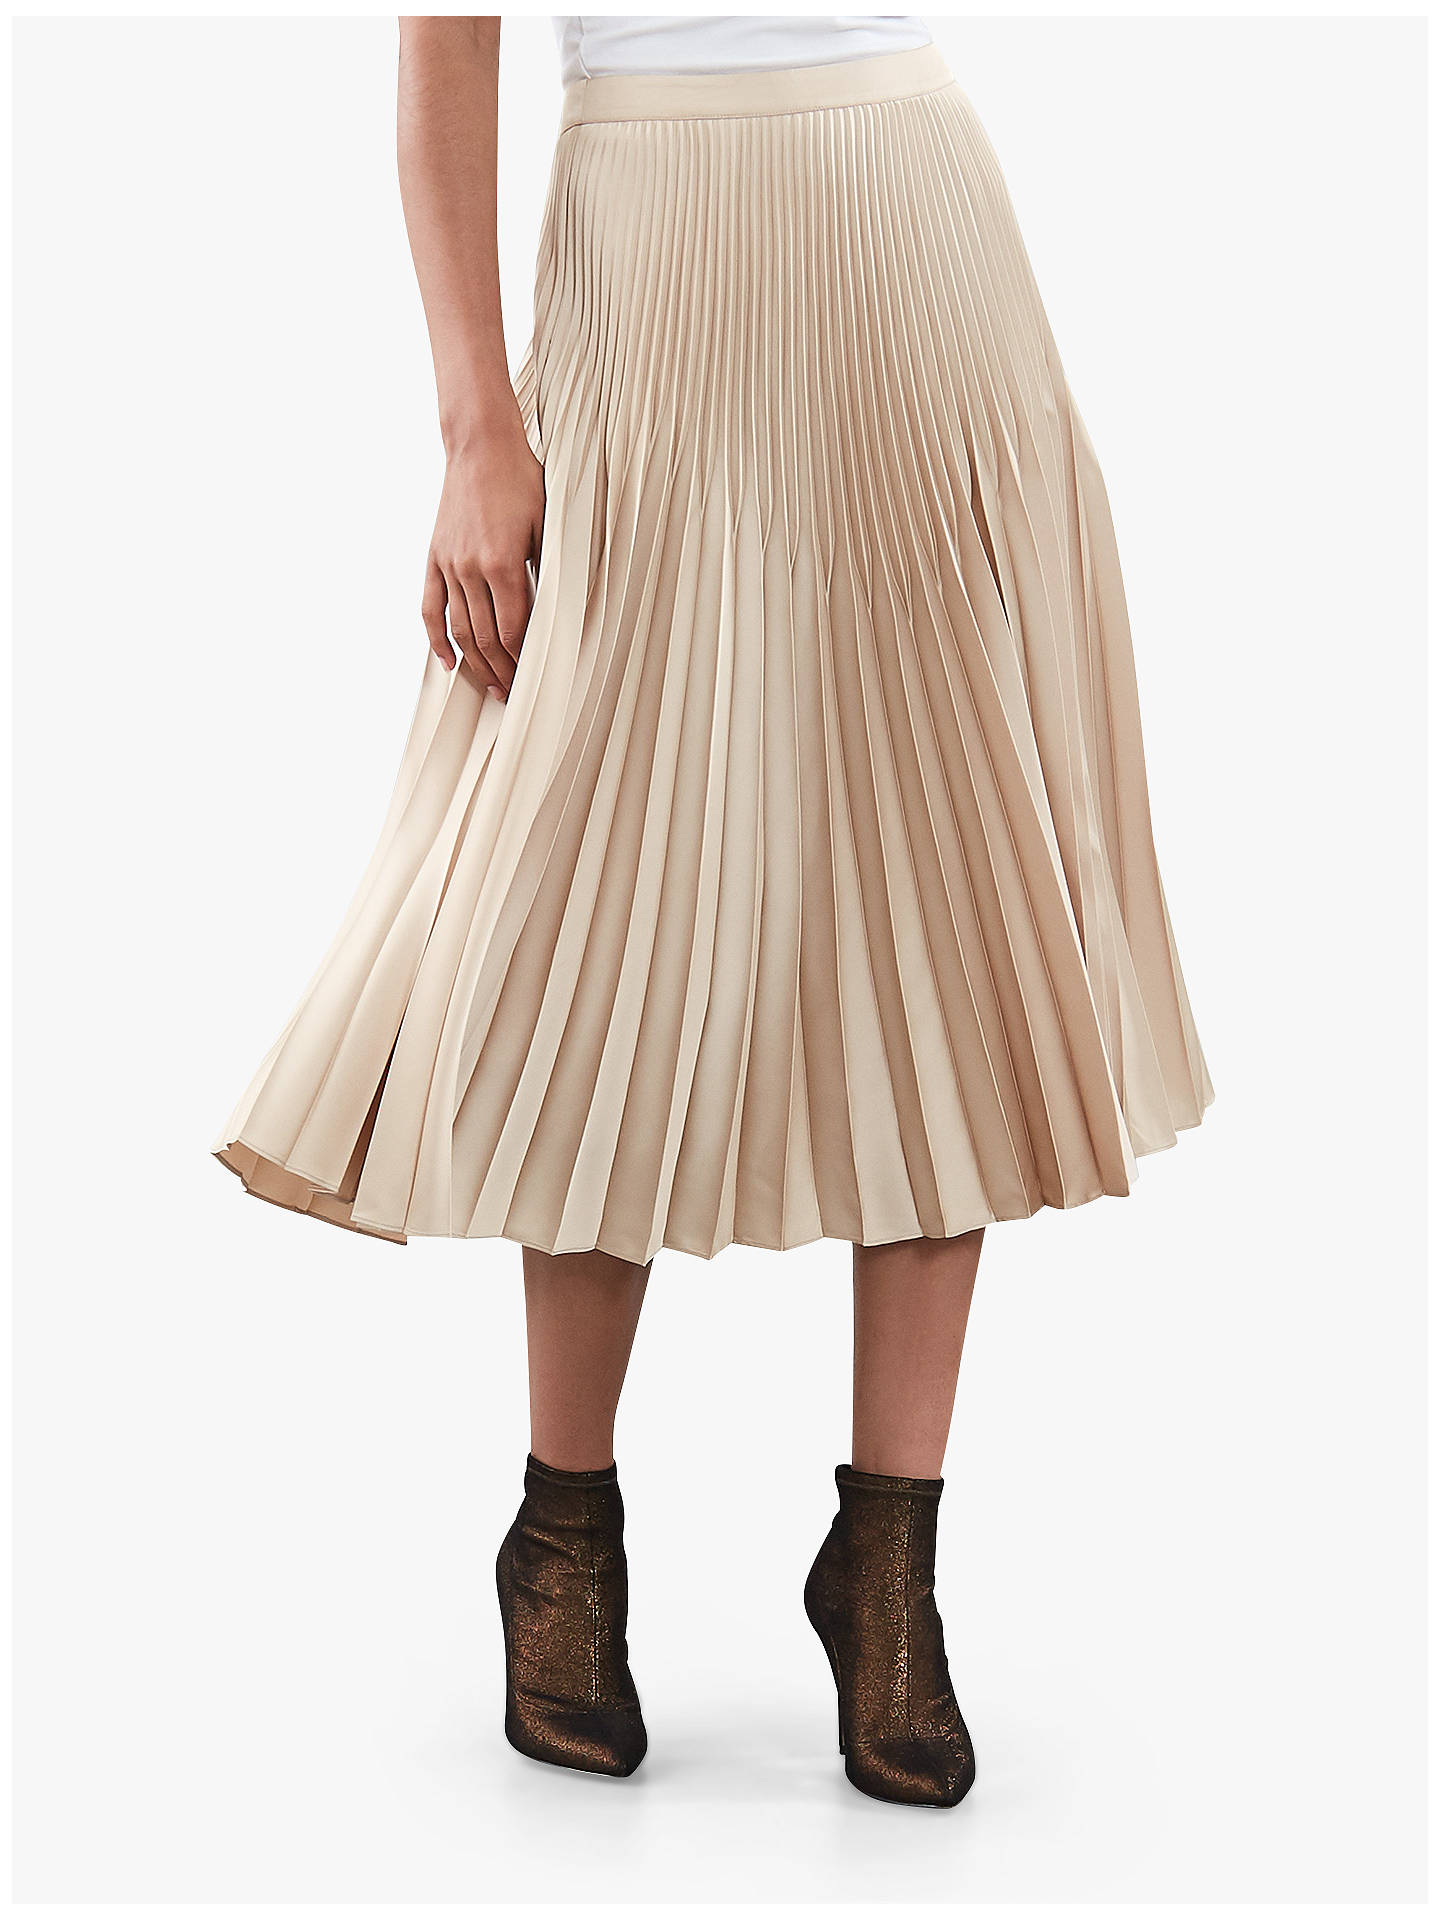 4965a8273 Buy Reiss Isidora Metallic Knife Pleat Midi Skirt, Light Gold, 6 Online at  johnlewis ...